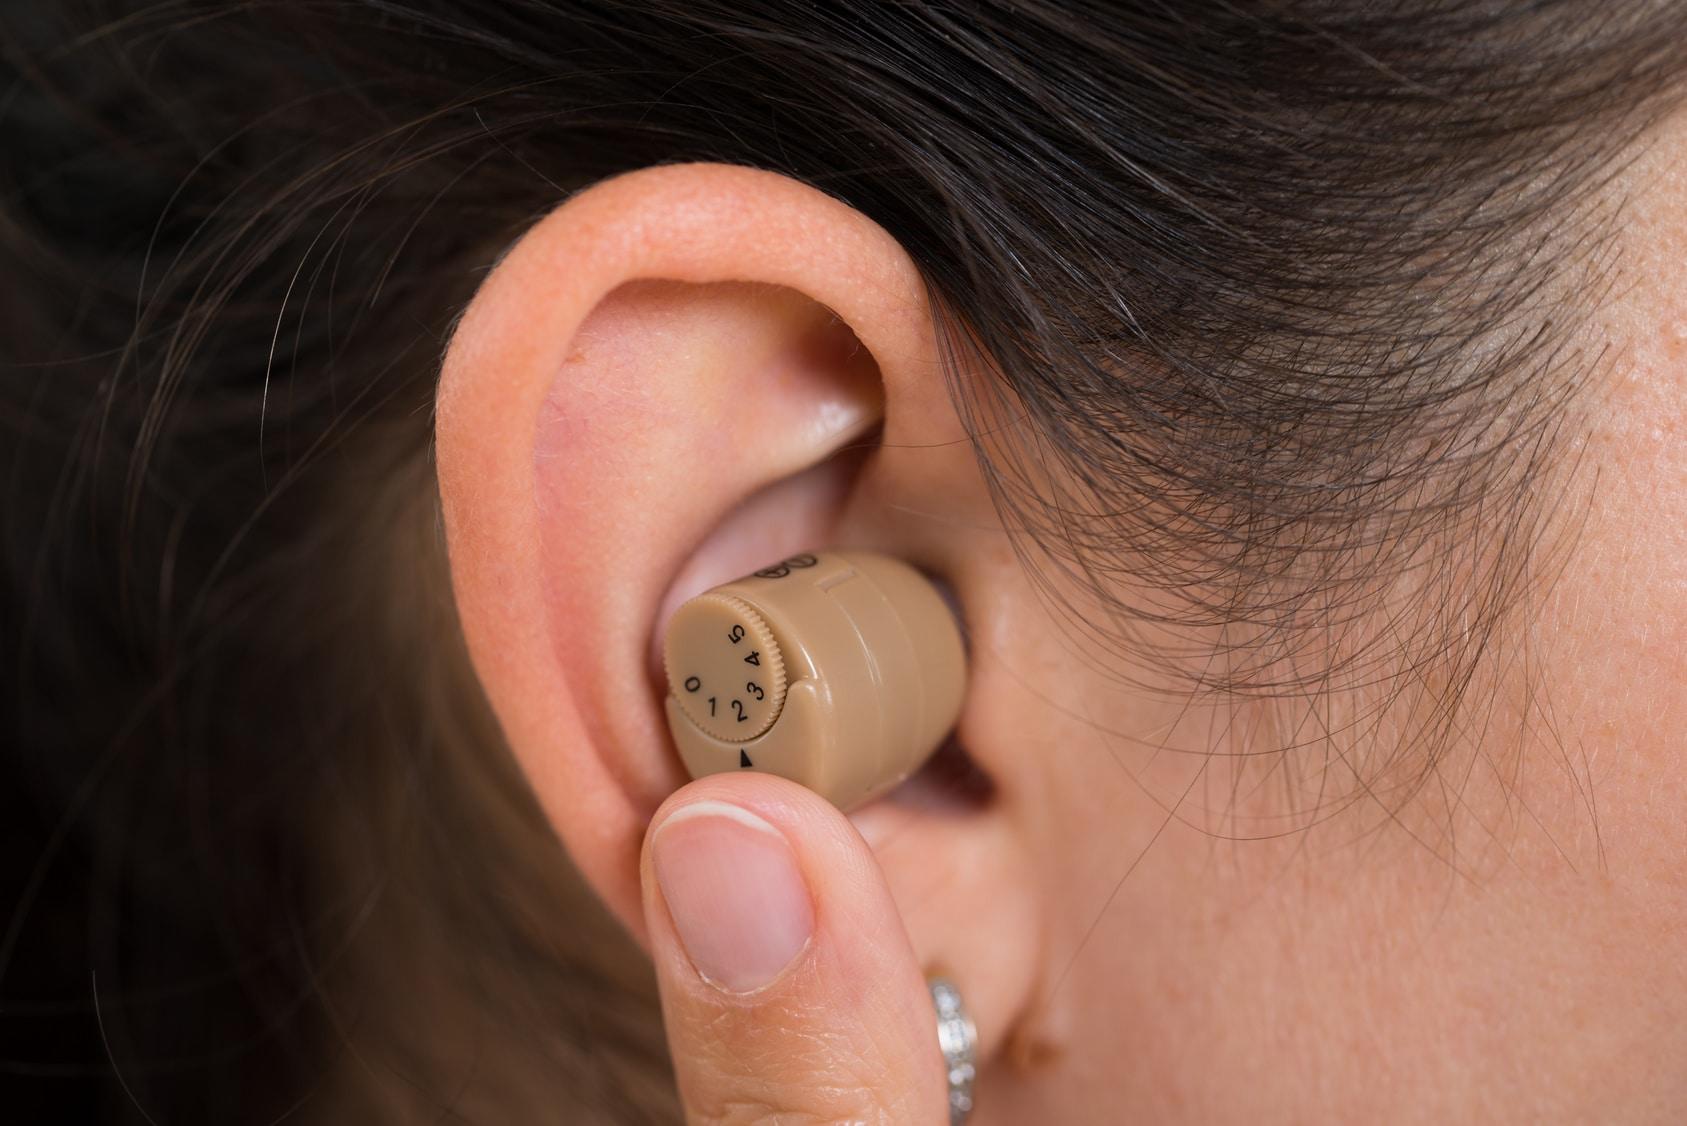 L'usage de la prothèse auditive